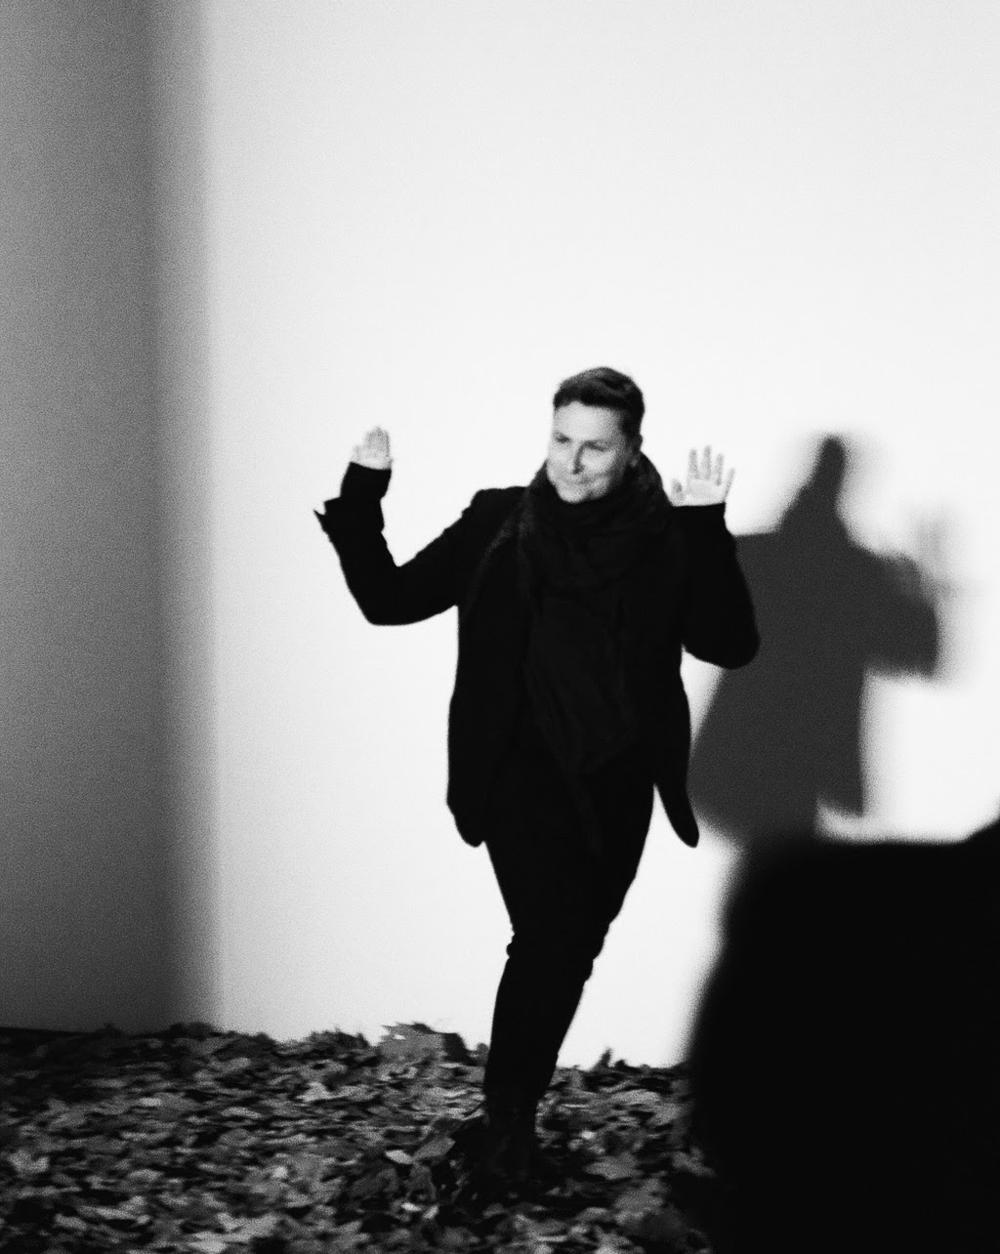 fot. Joseph Wolfgang Ohlert/mat. prasowe Dawid Tomaszewski